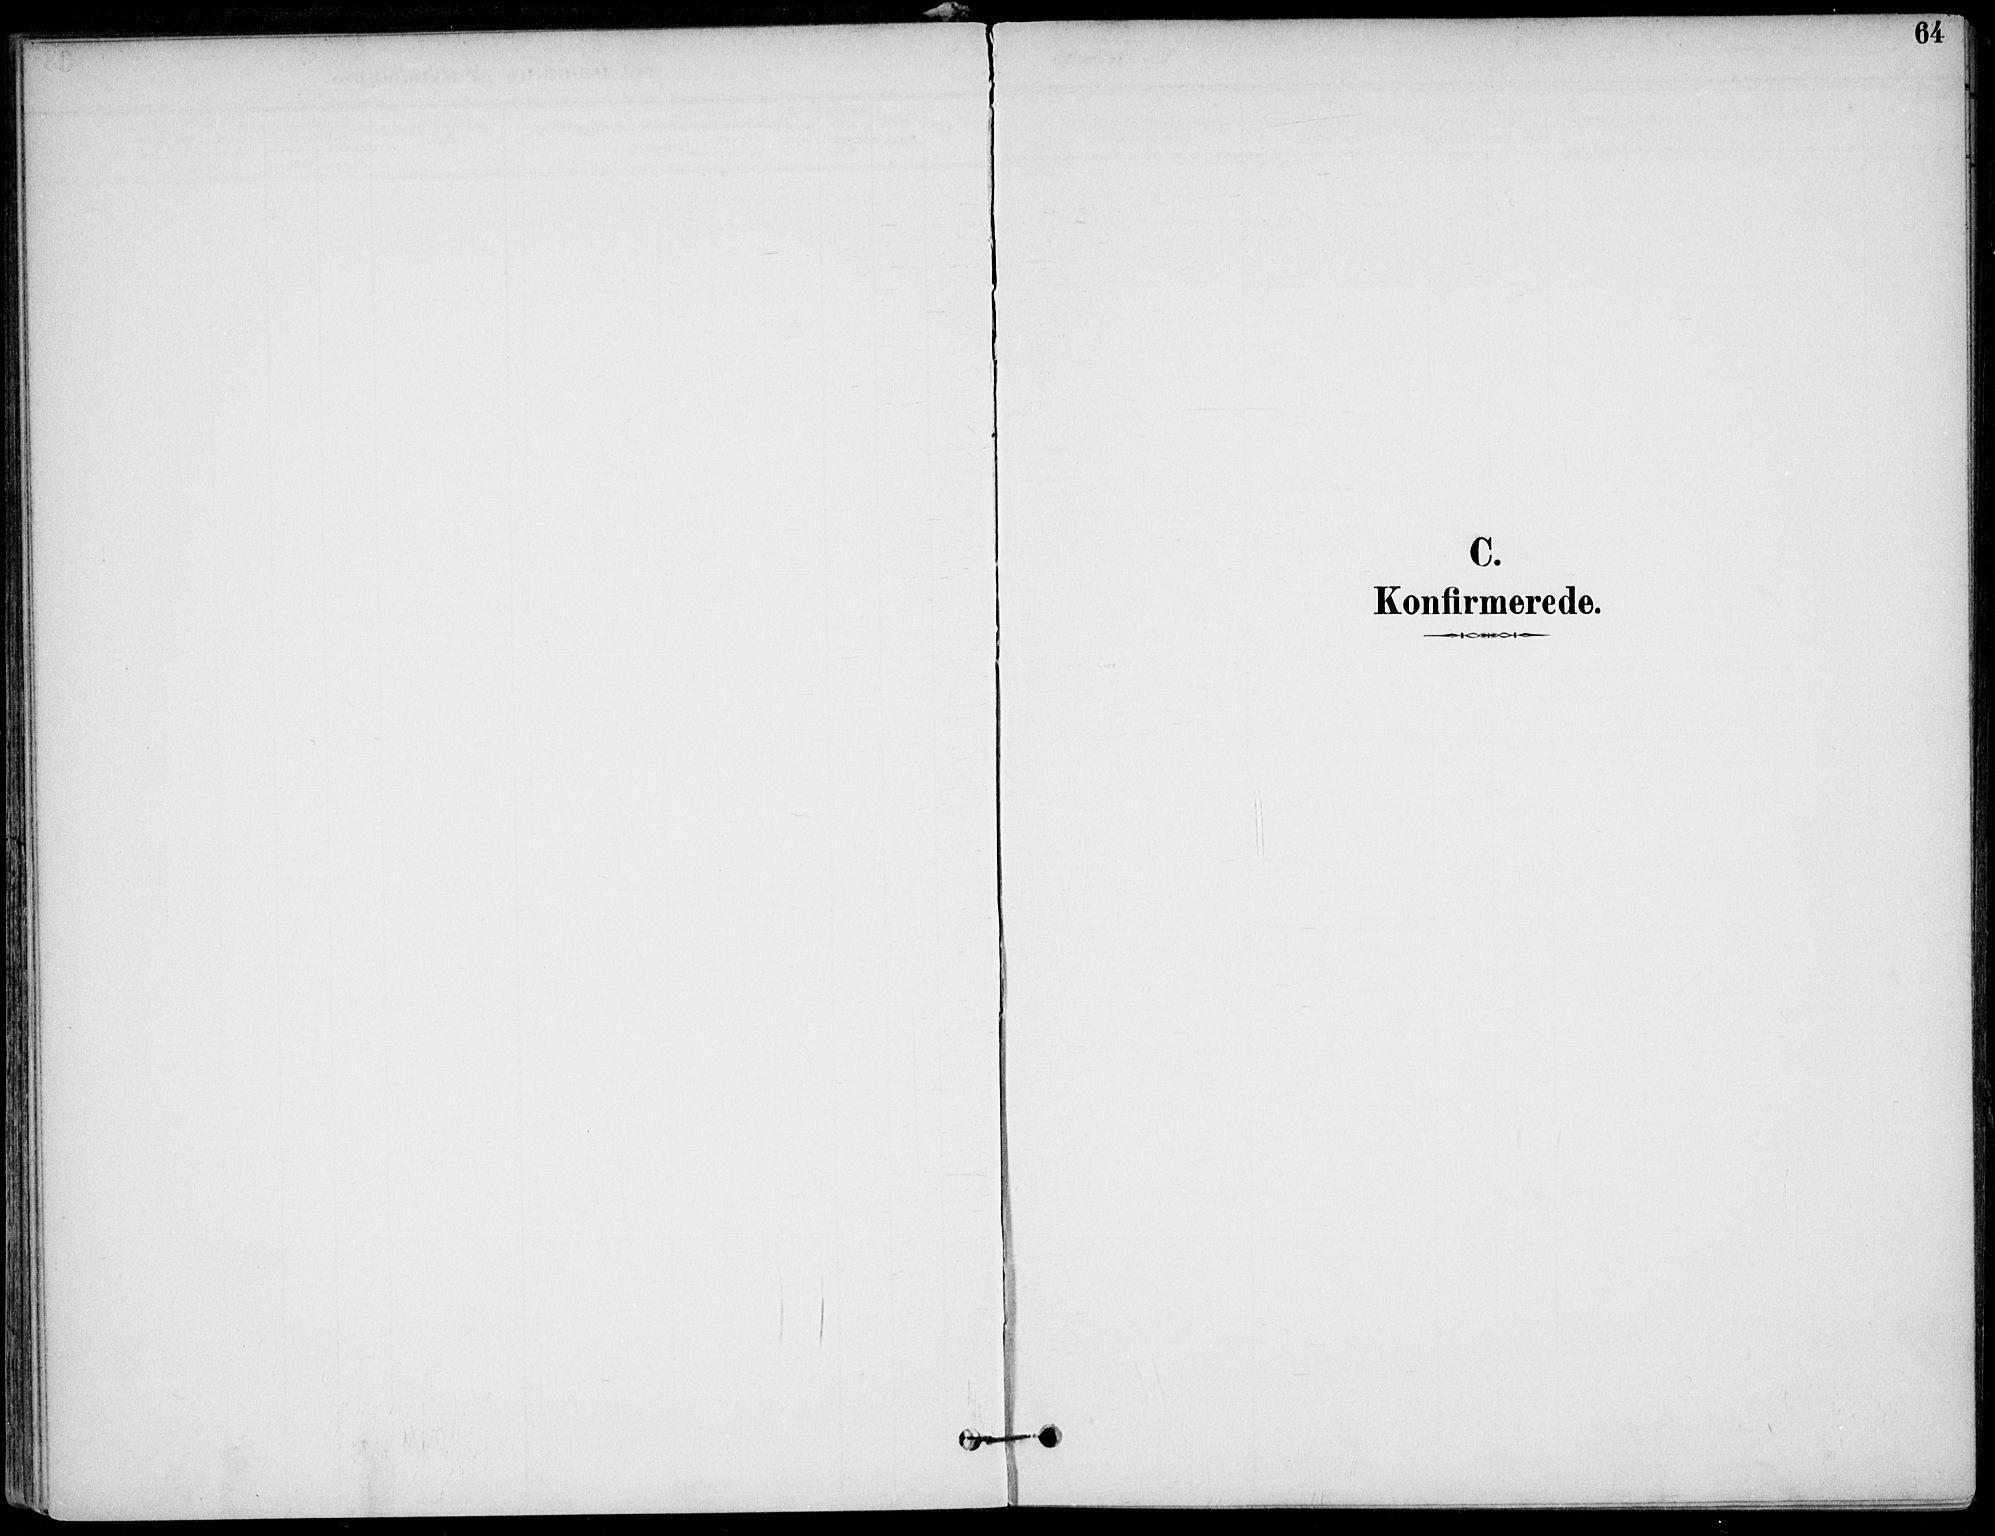 SAKO, Lunde kirkebøker, F/Fa/L0003: Ministerialbok nr. I 3, 1893-1902, s. 64